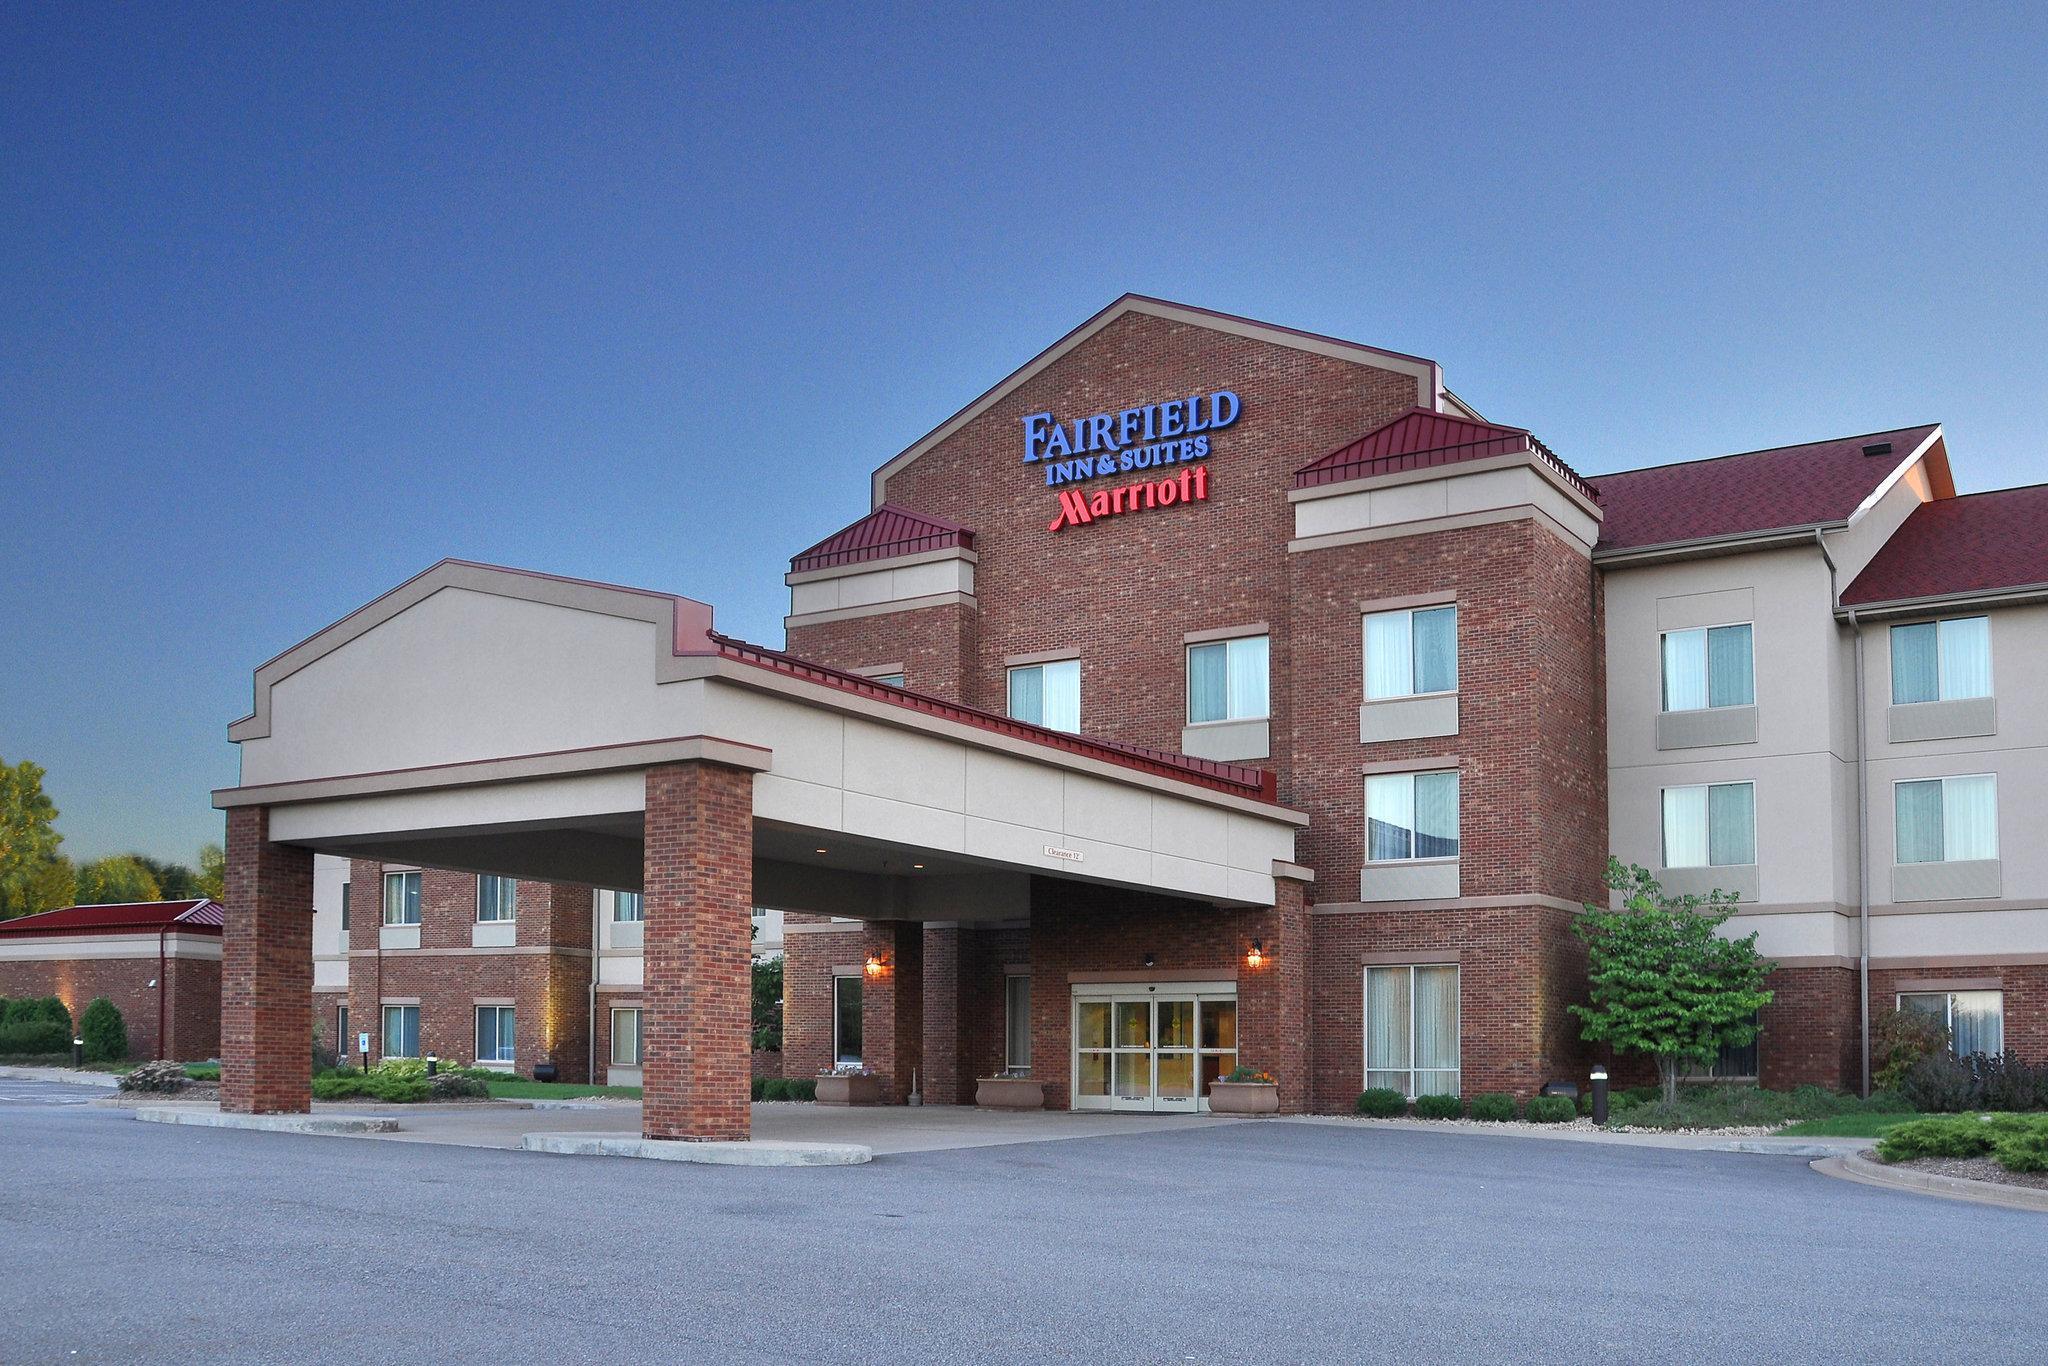 Fairfield Inn And Suites Wausau